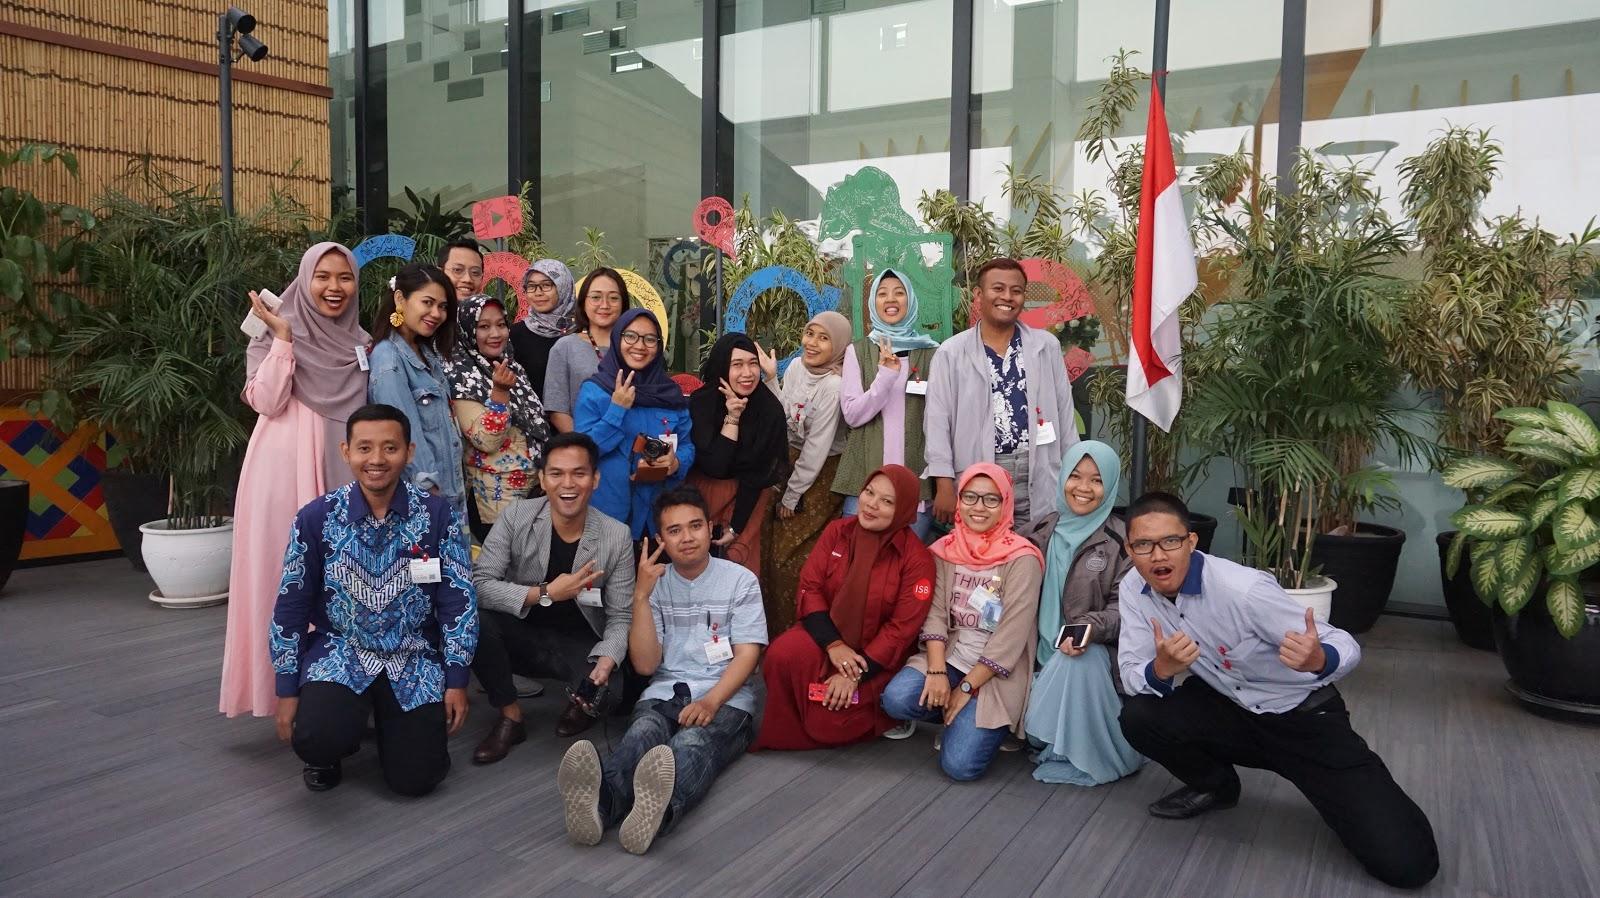 Pengalaman Seru Belajar Content Writing Bareng Komunitas ISB Di Kantor Google Indonesia